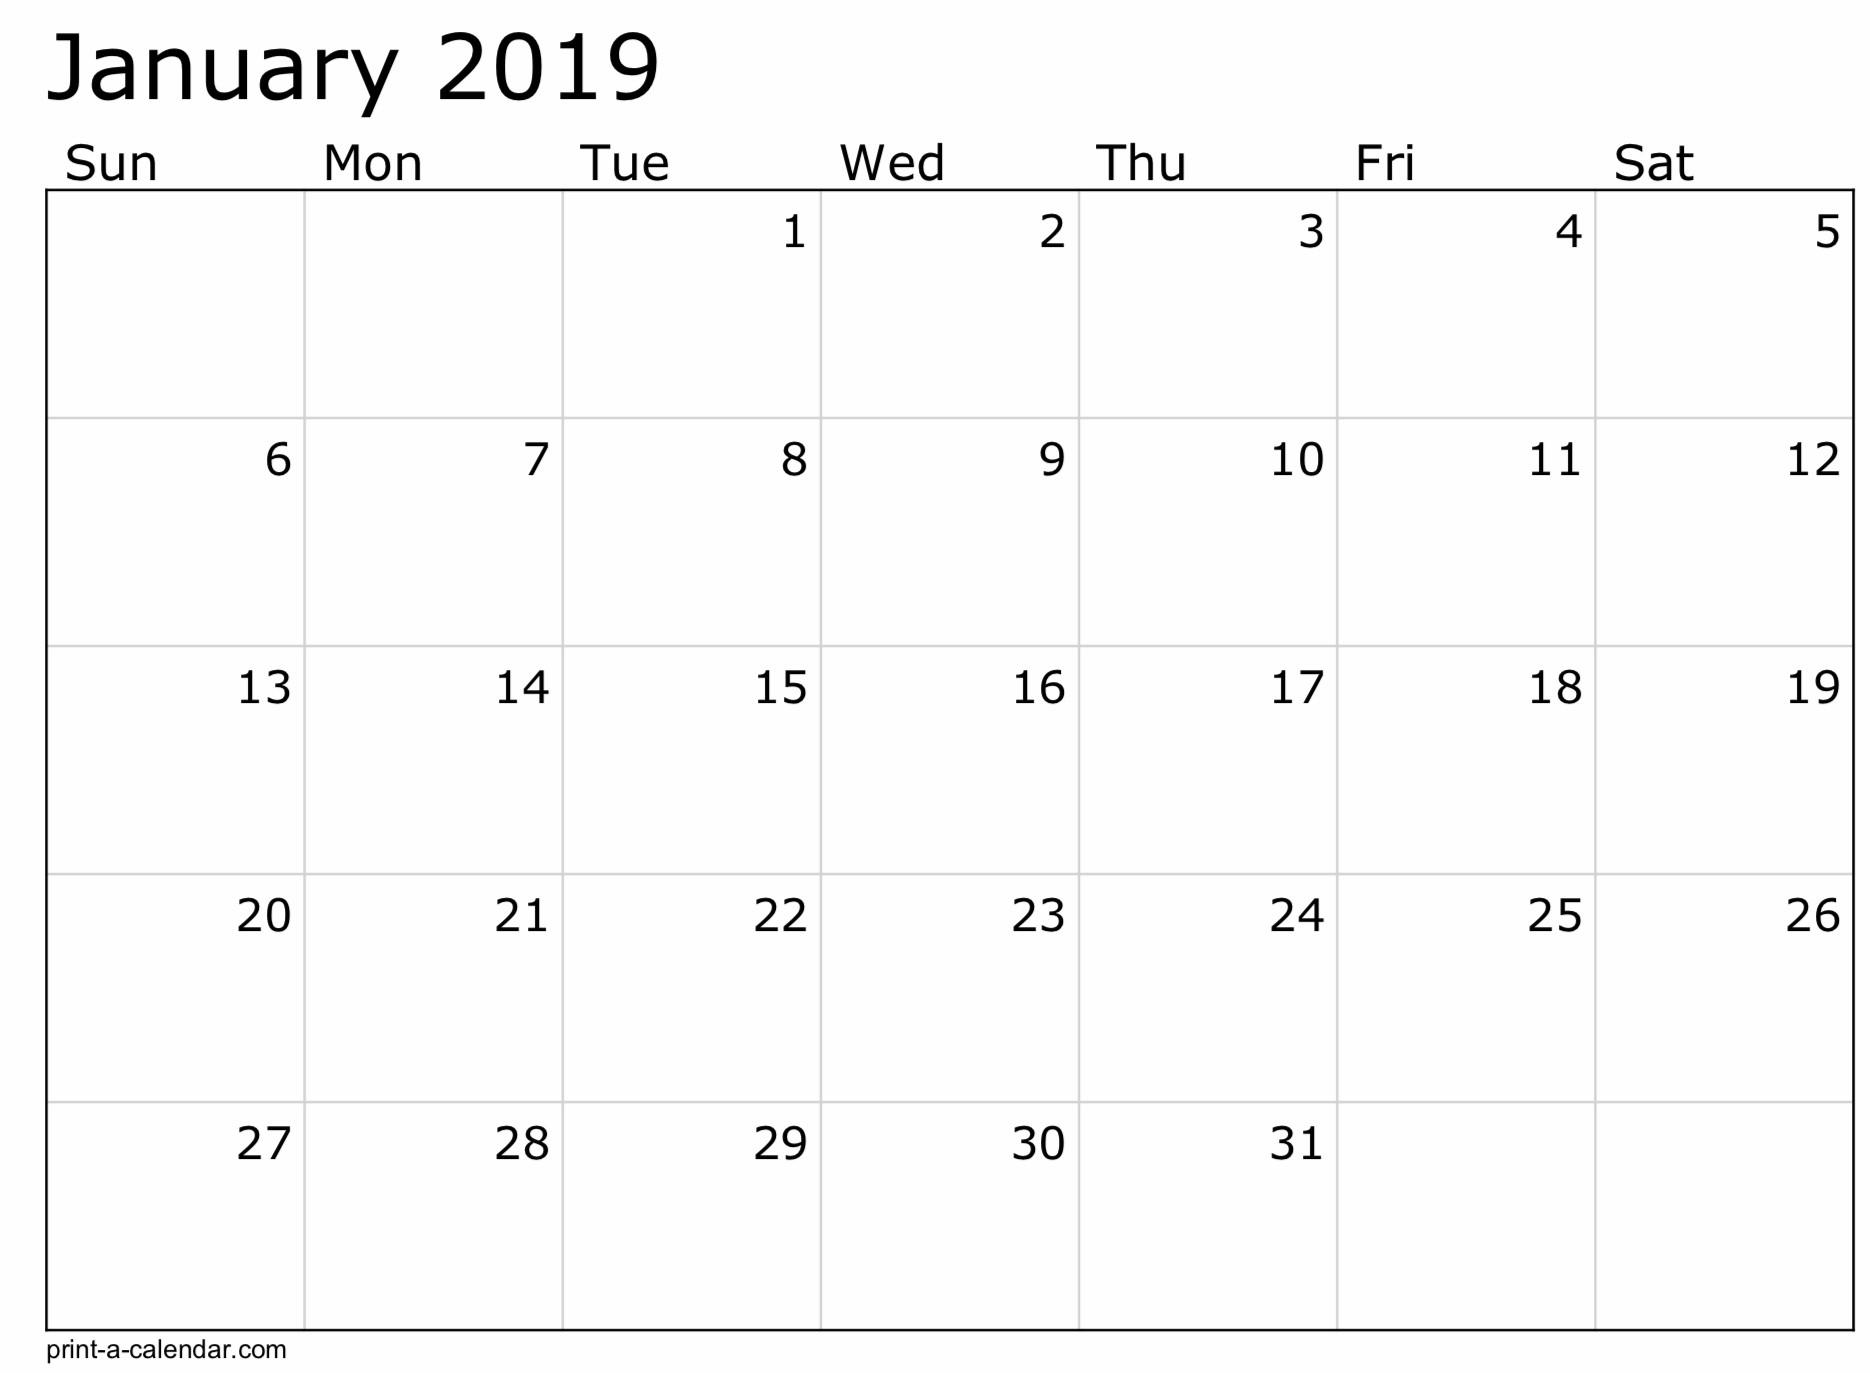 2019 Free Printable Calendar Templates - A Mother's Random-2 Monthly Printable Calender